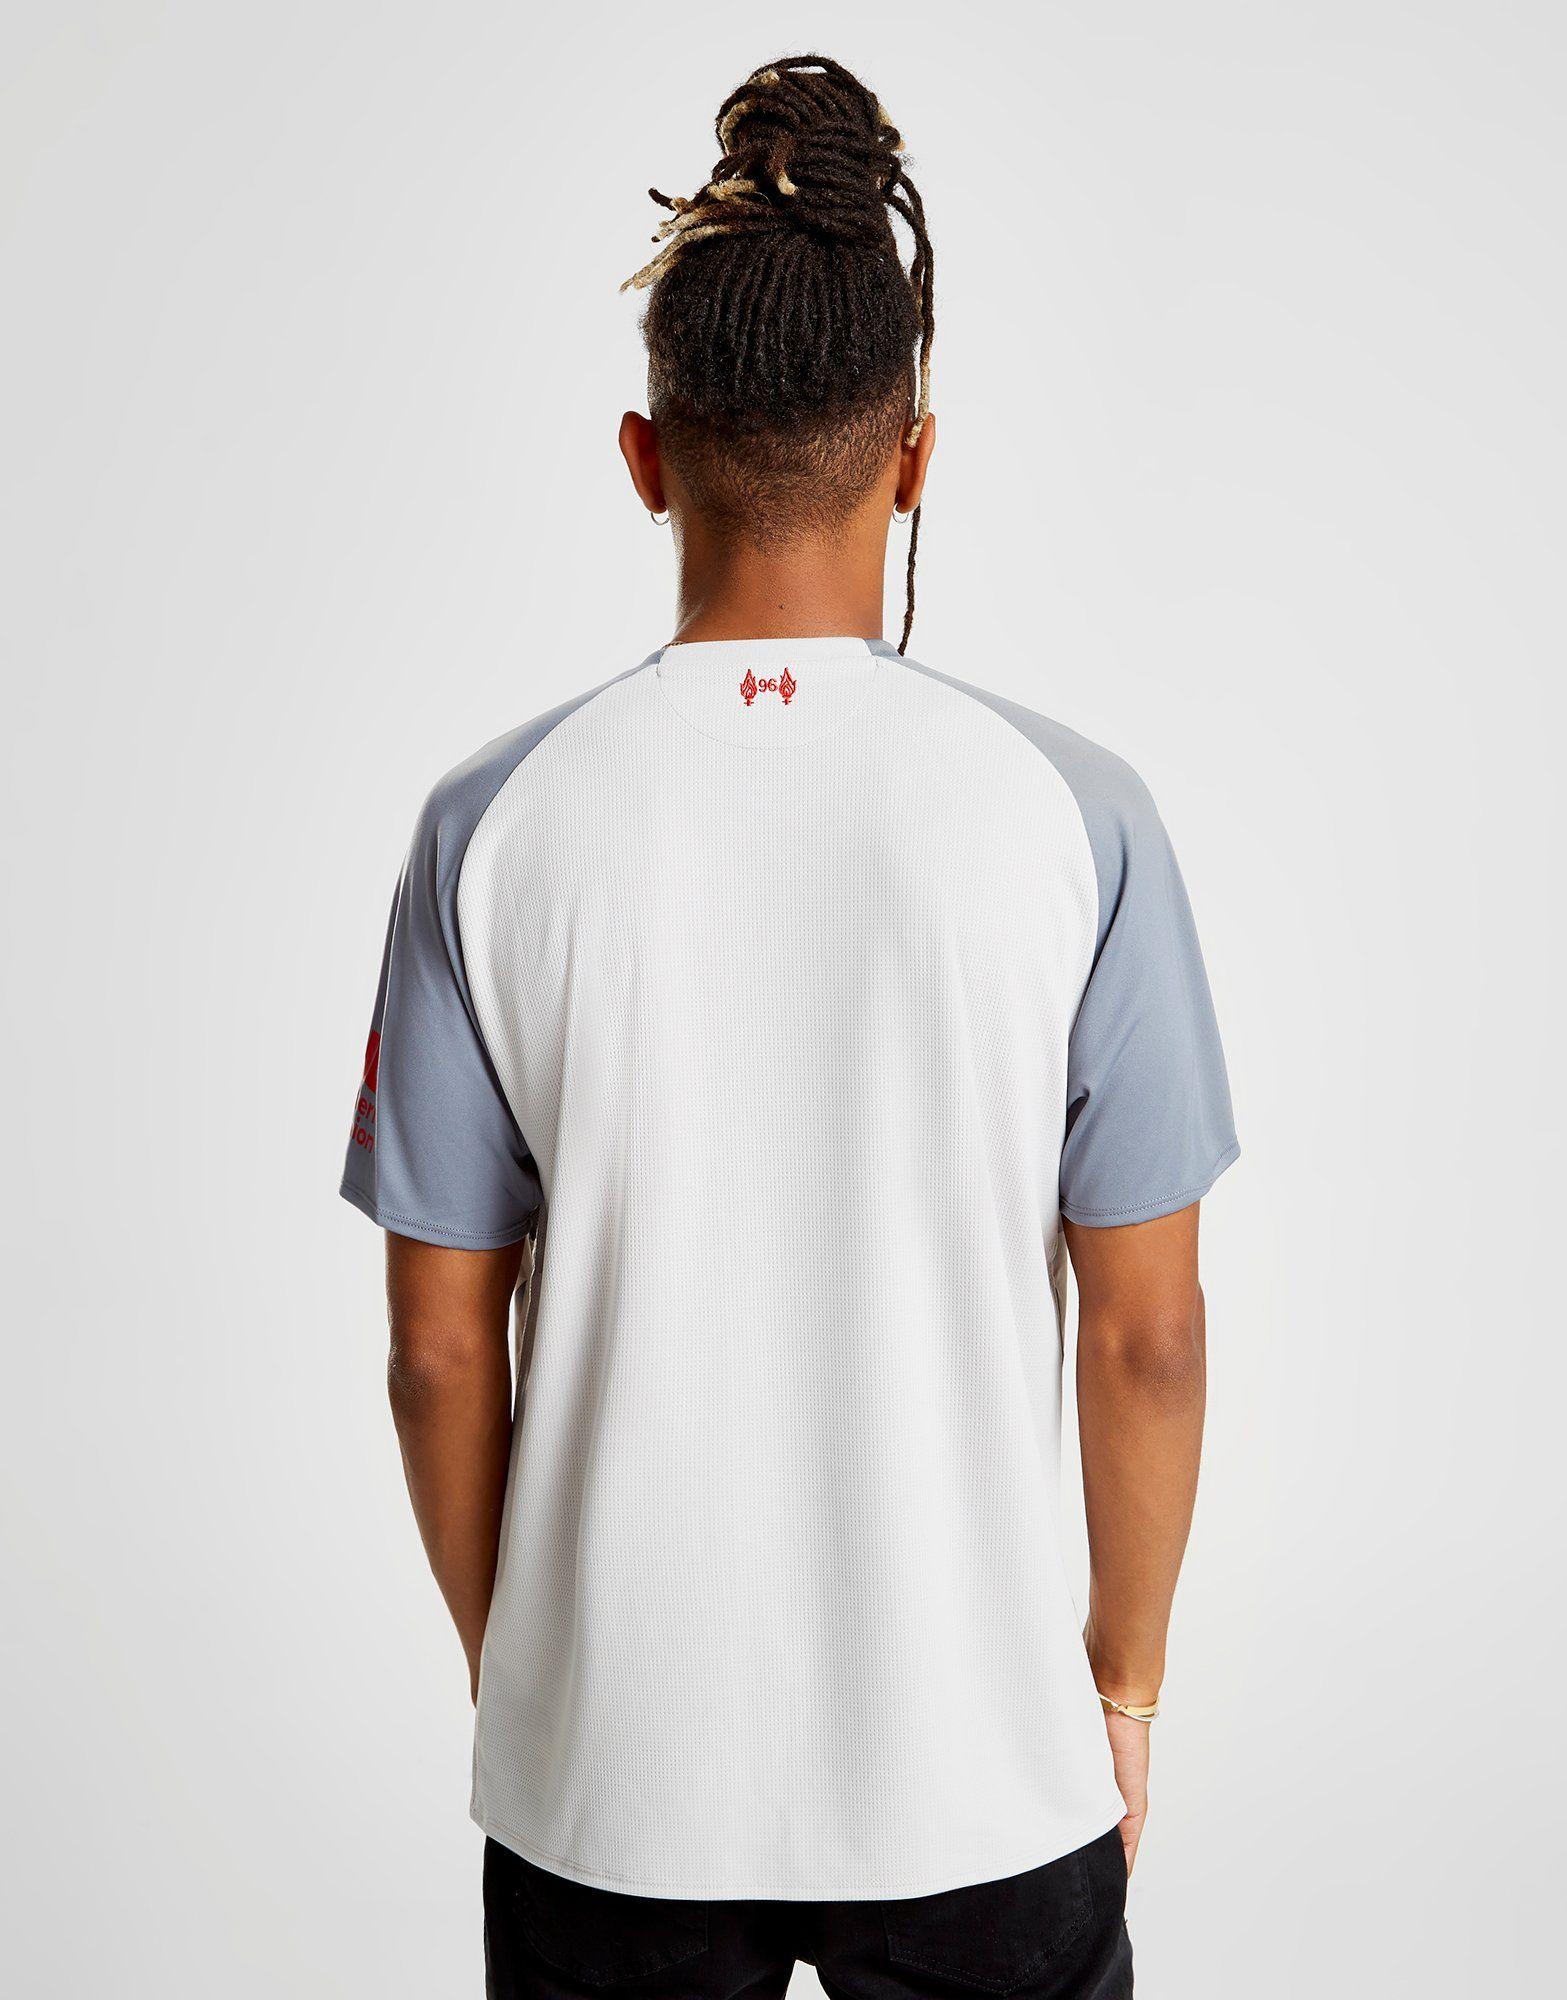 New Balance Liverpool FC 2018/19 Third Shirt